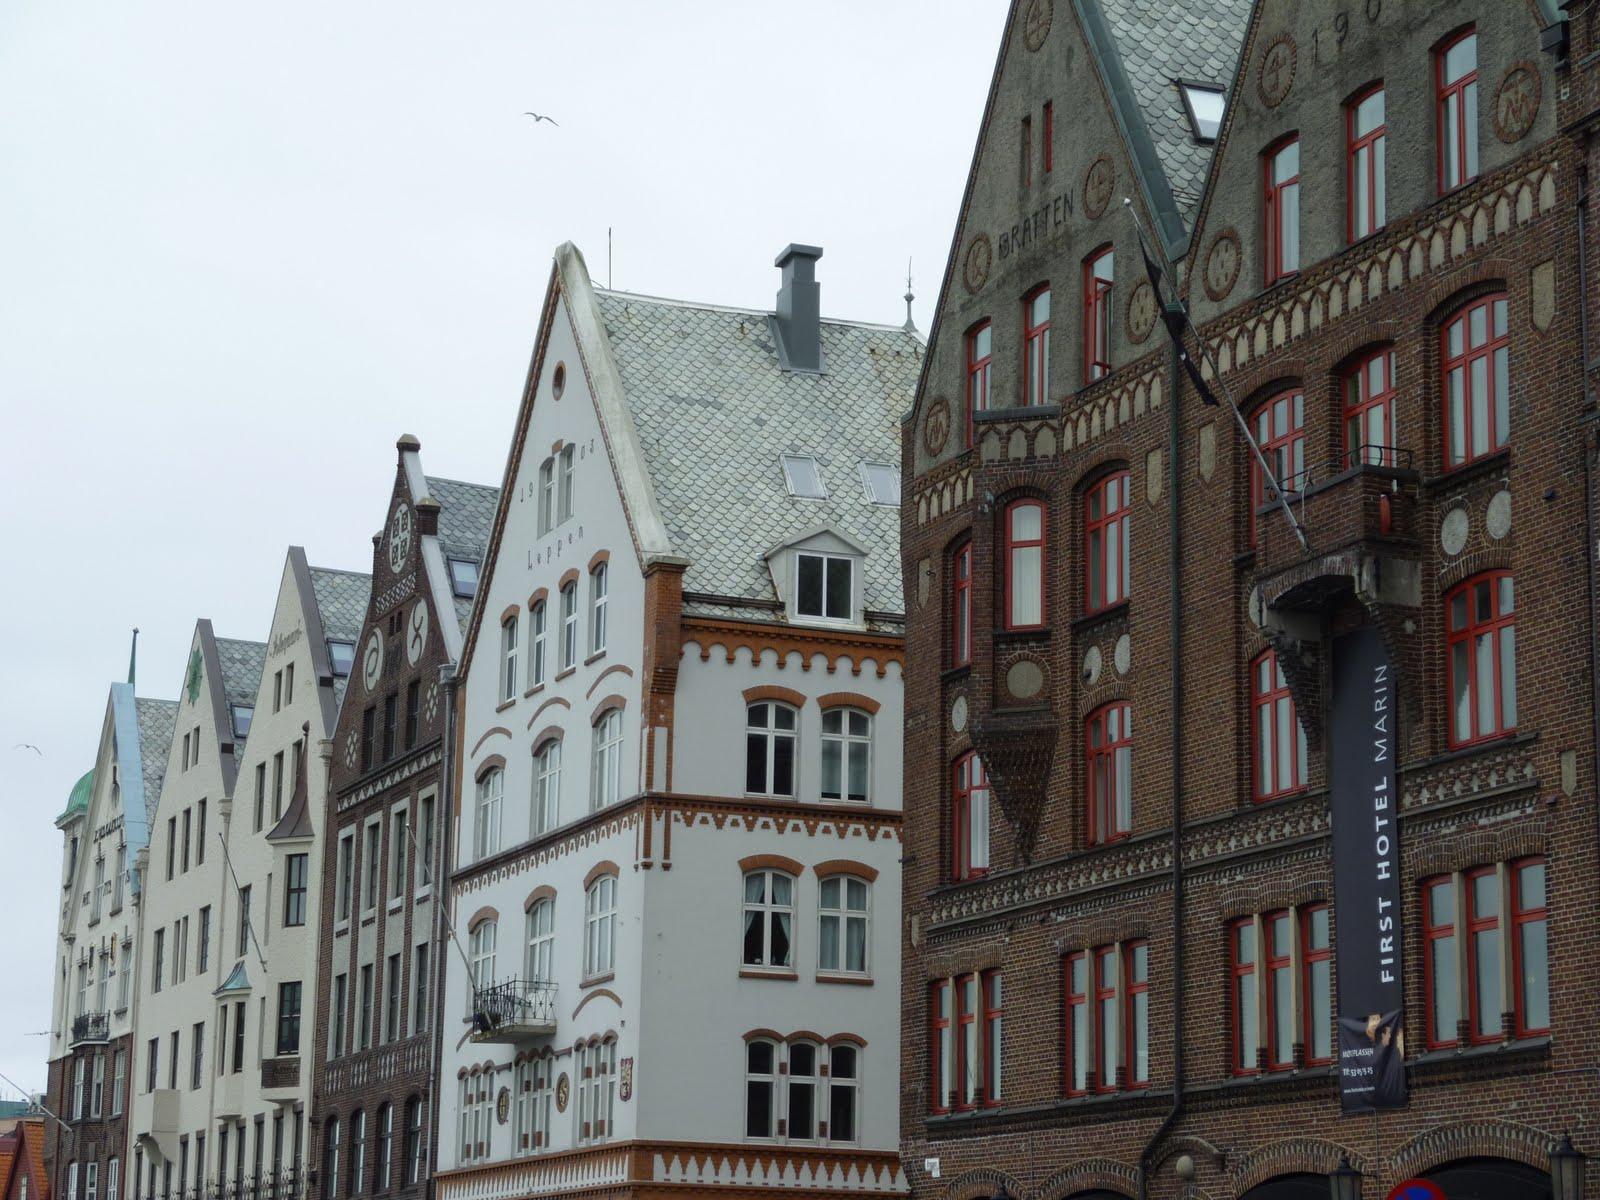 Pauline en norv ge jour 4 bergen - Office de tourisme bergen ...